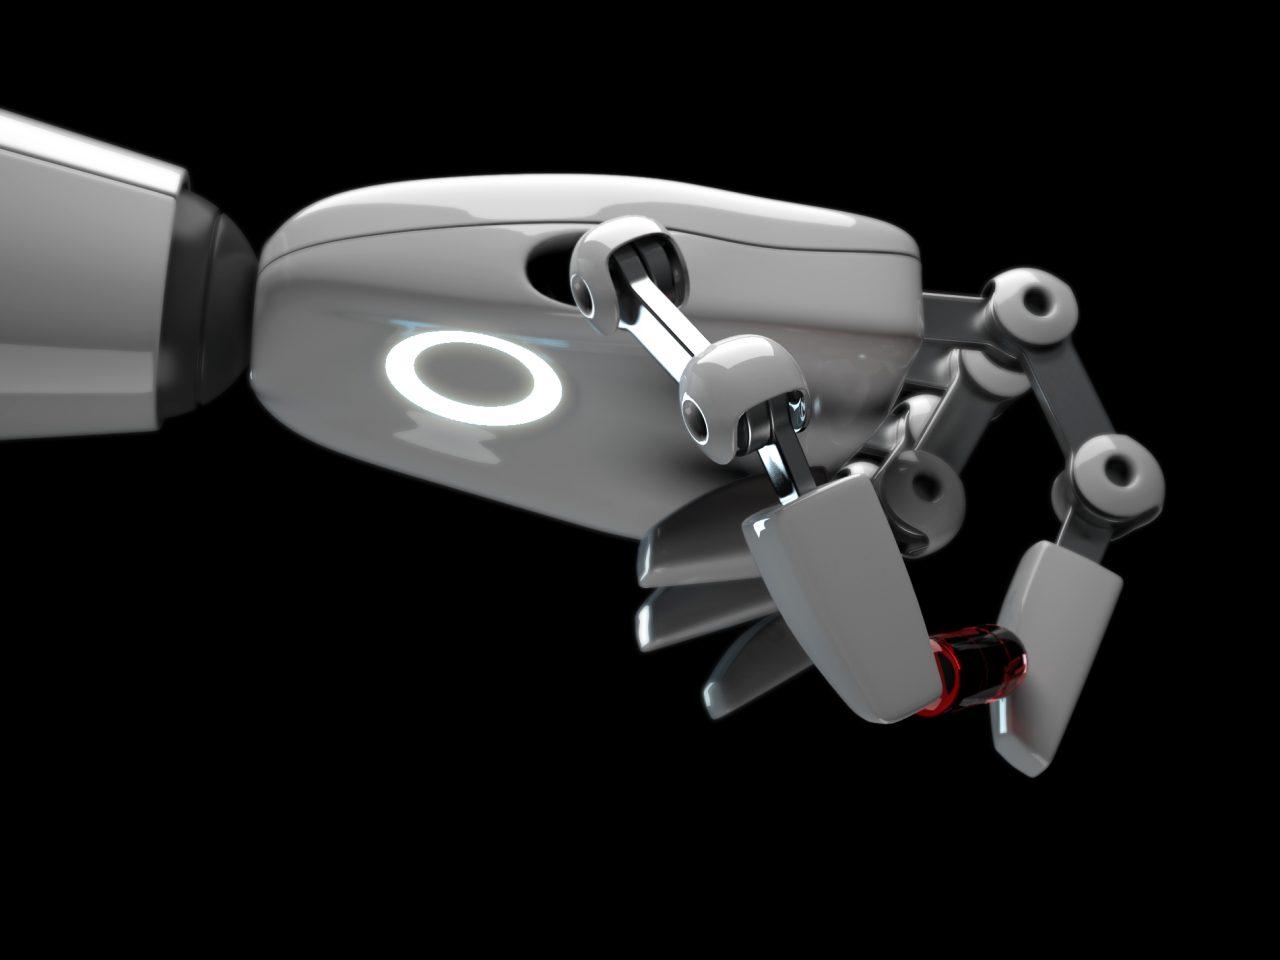 Robo hand01 fertig